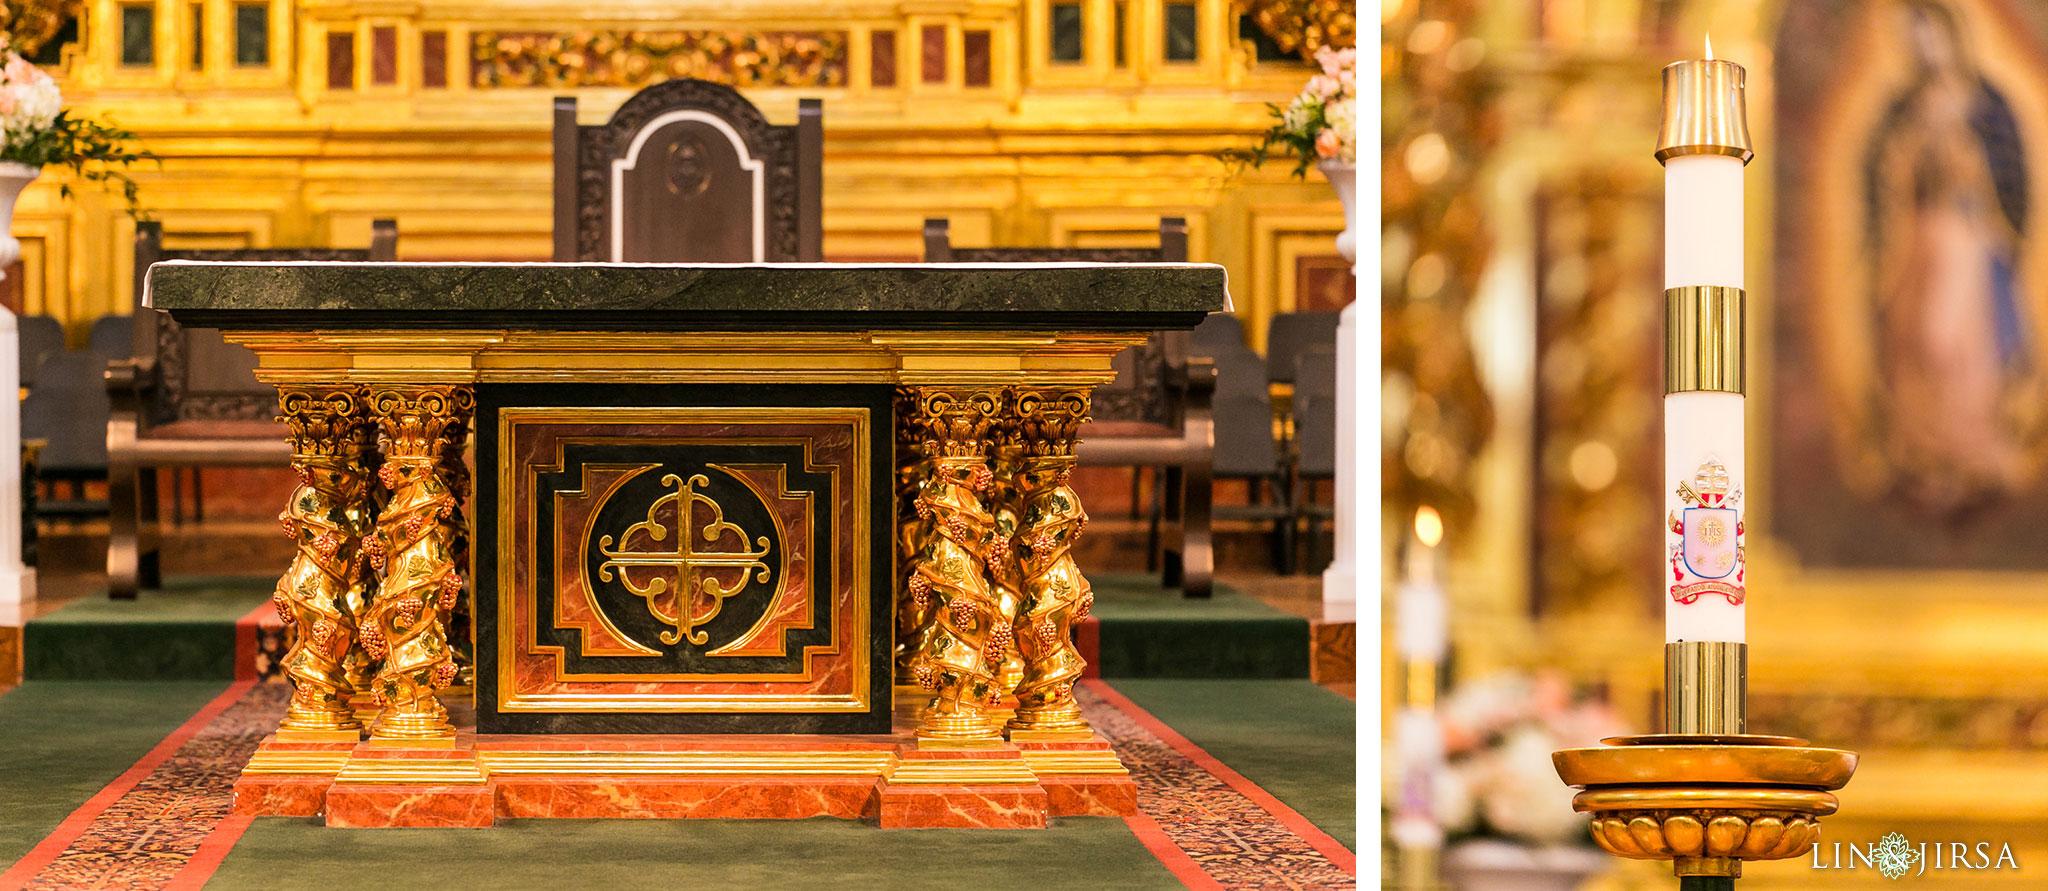 20 mission basilica san juan capistrano wedding ceremony photography